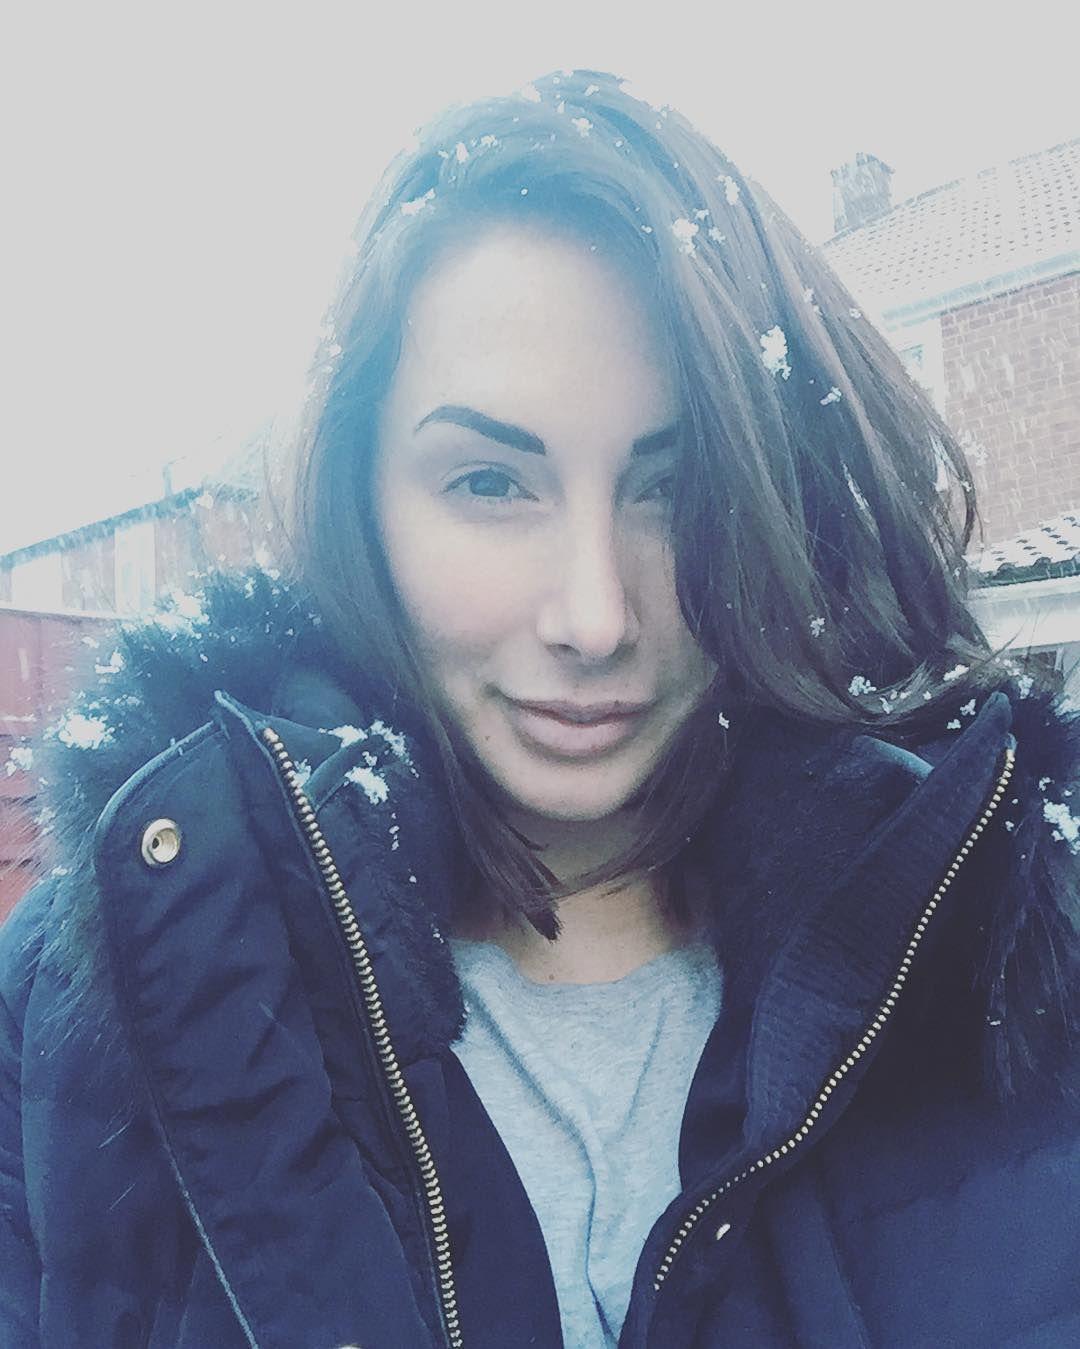 Paige turnah instagram